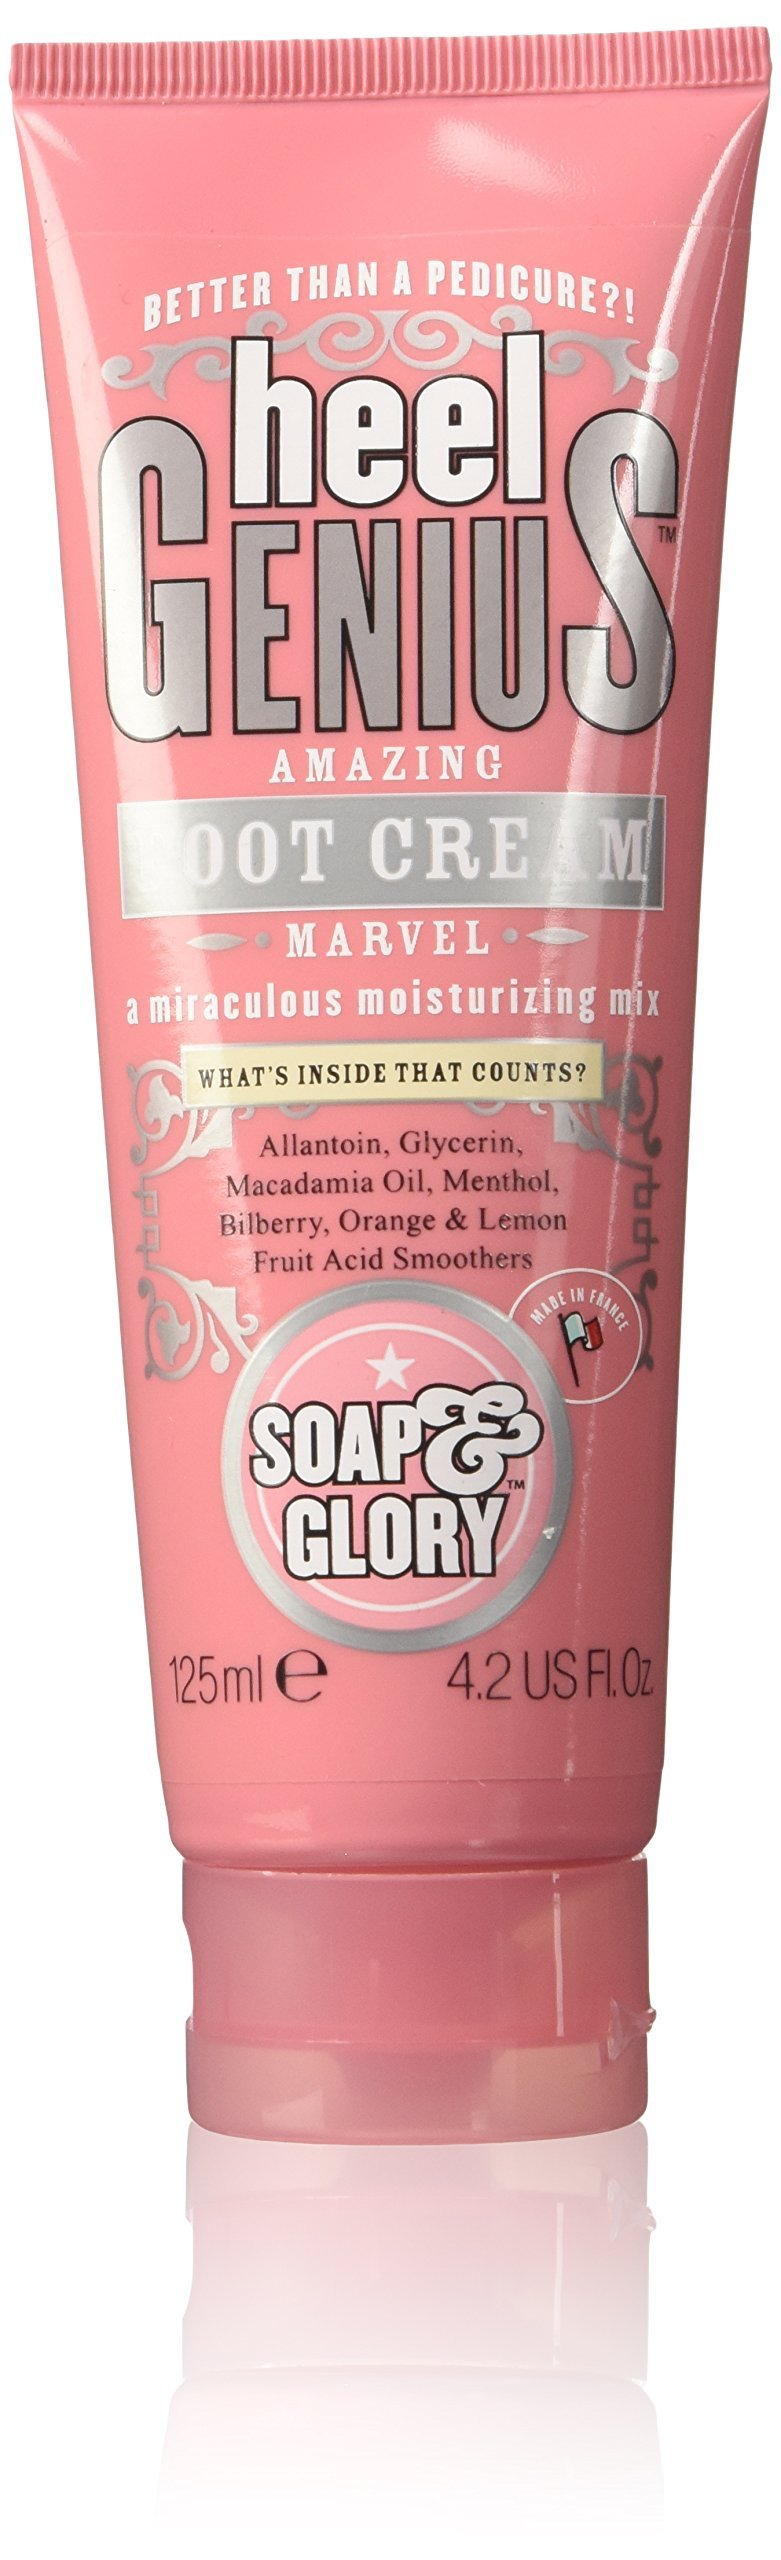 Soap & Glory Heel Genius Amazing Foot Cream 4.2 oz (125 ml)